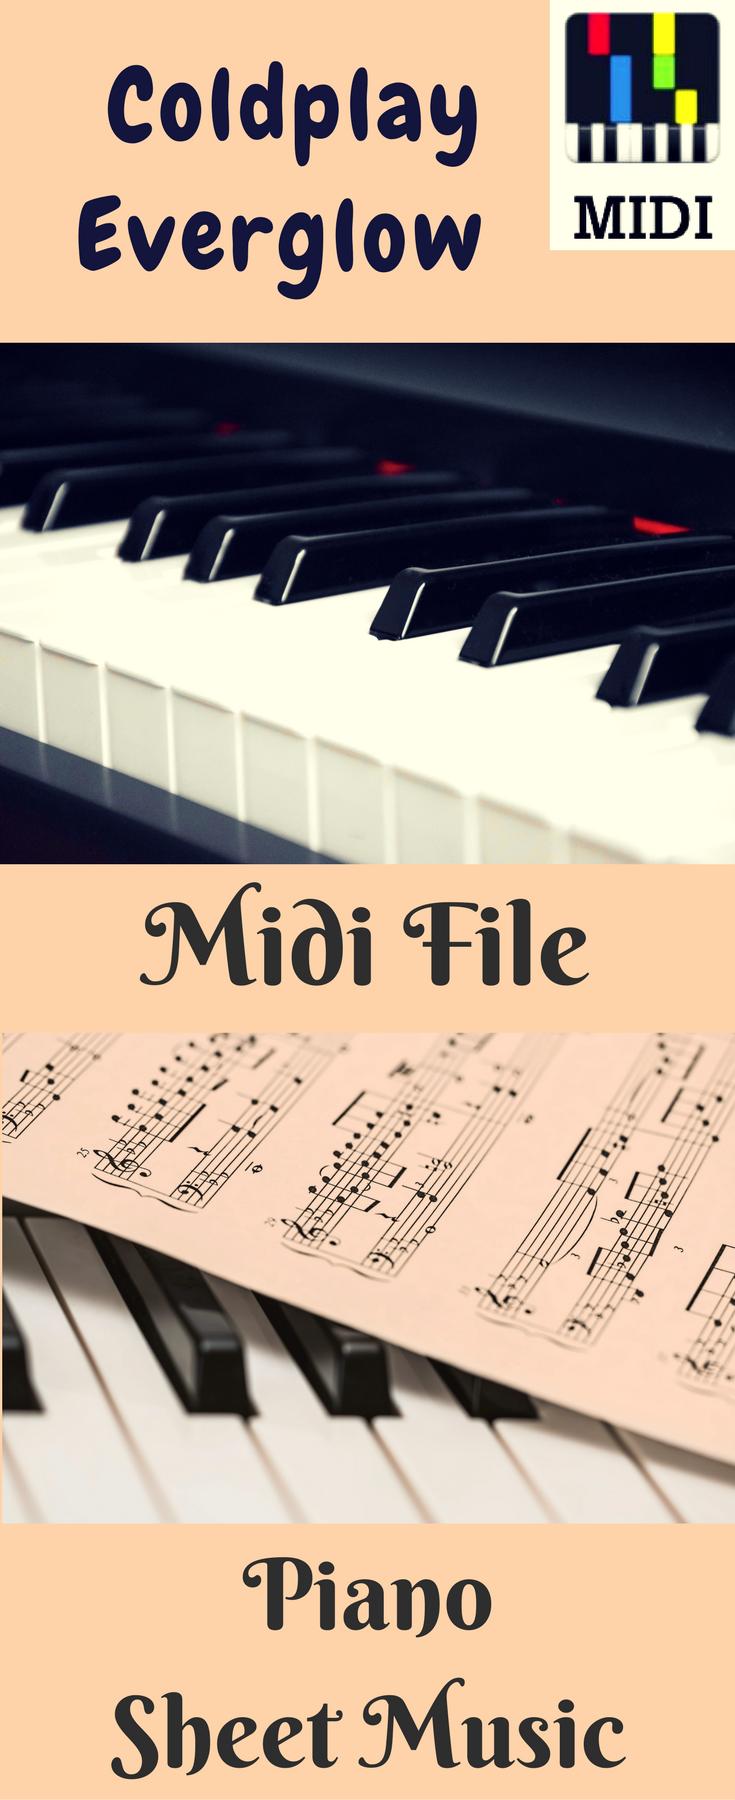 Coldplay Everglow Midi | Piano Midi Files & Sheet Music